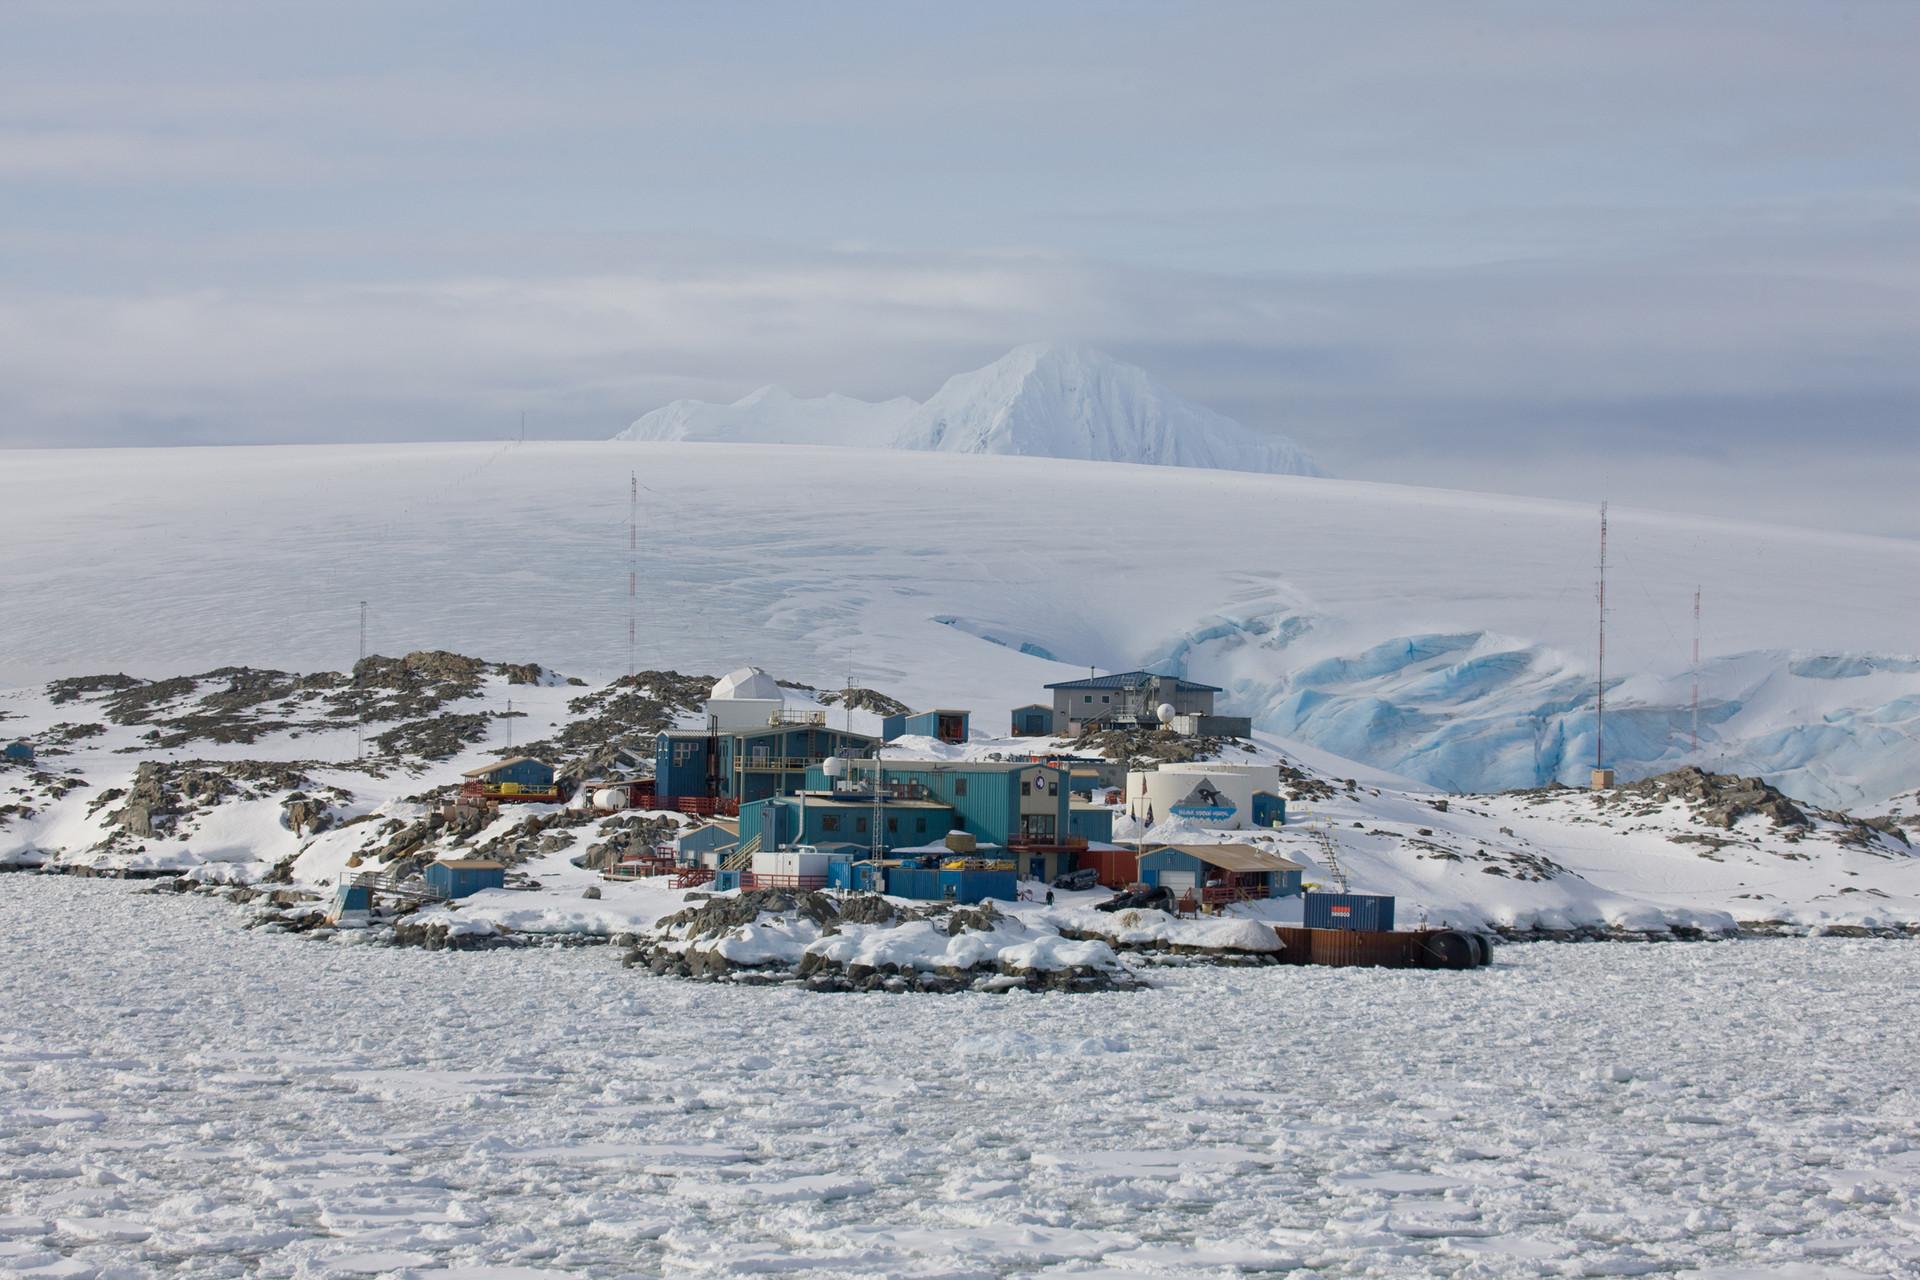 Field Station Palmer. Antarctic Peninsula, 2008